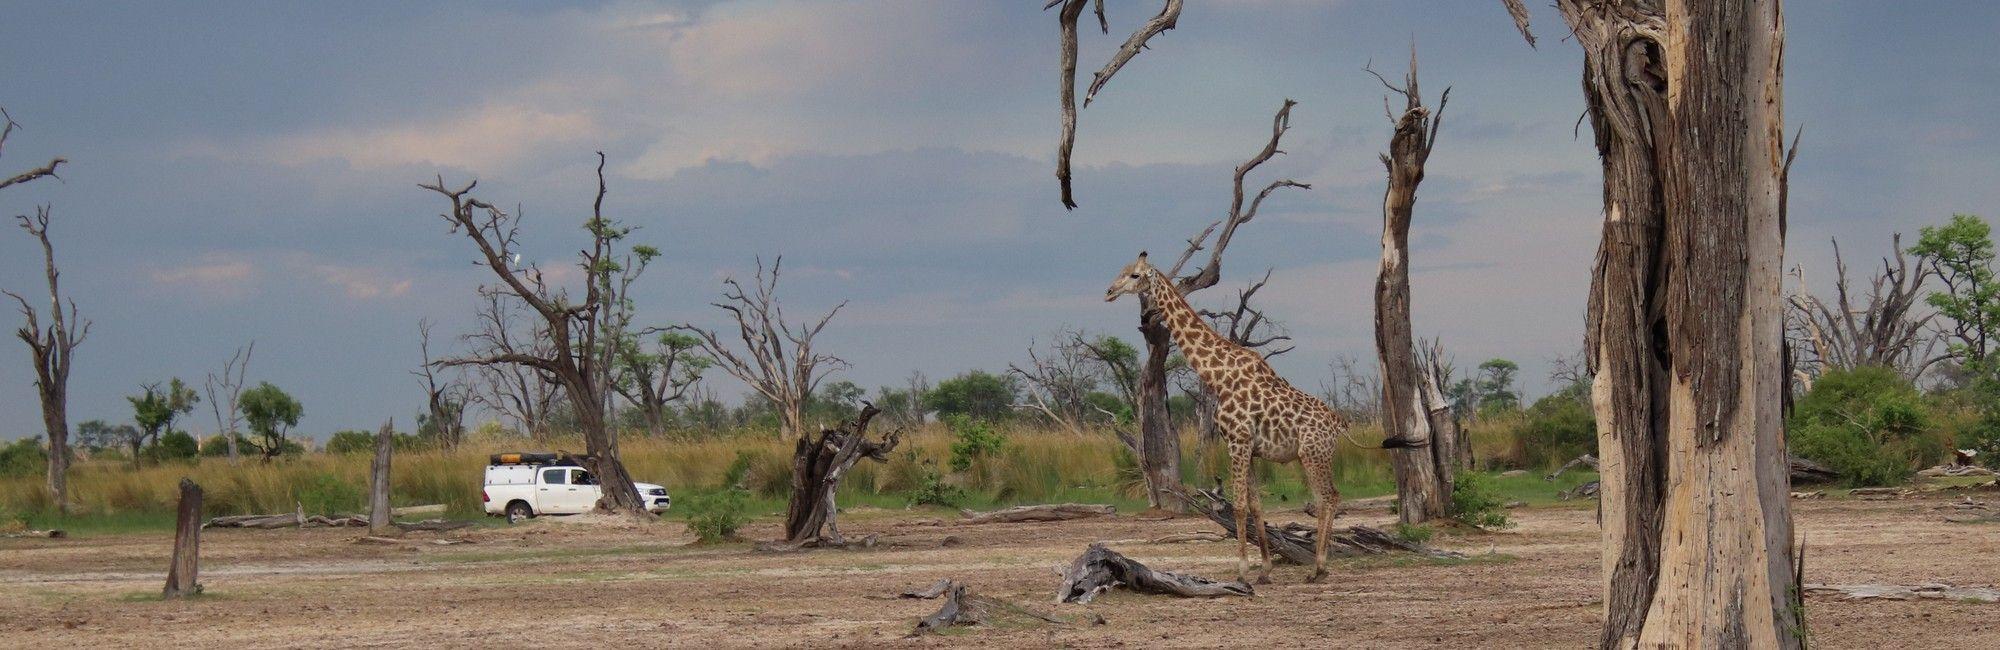 Self drive 4x4 rondreis Botswana